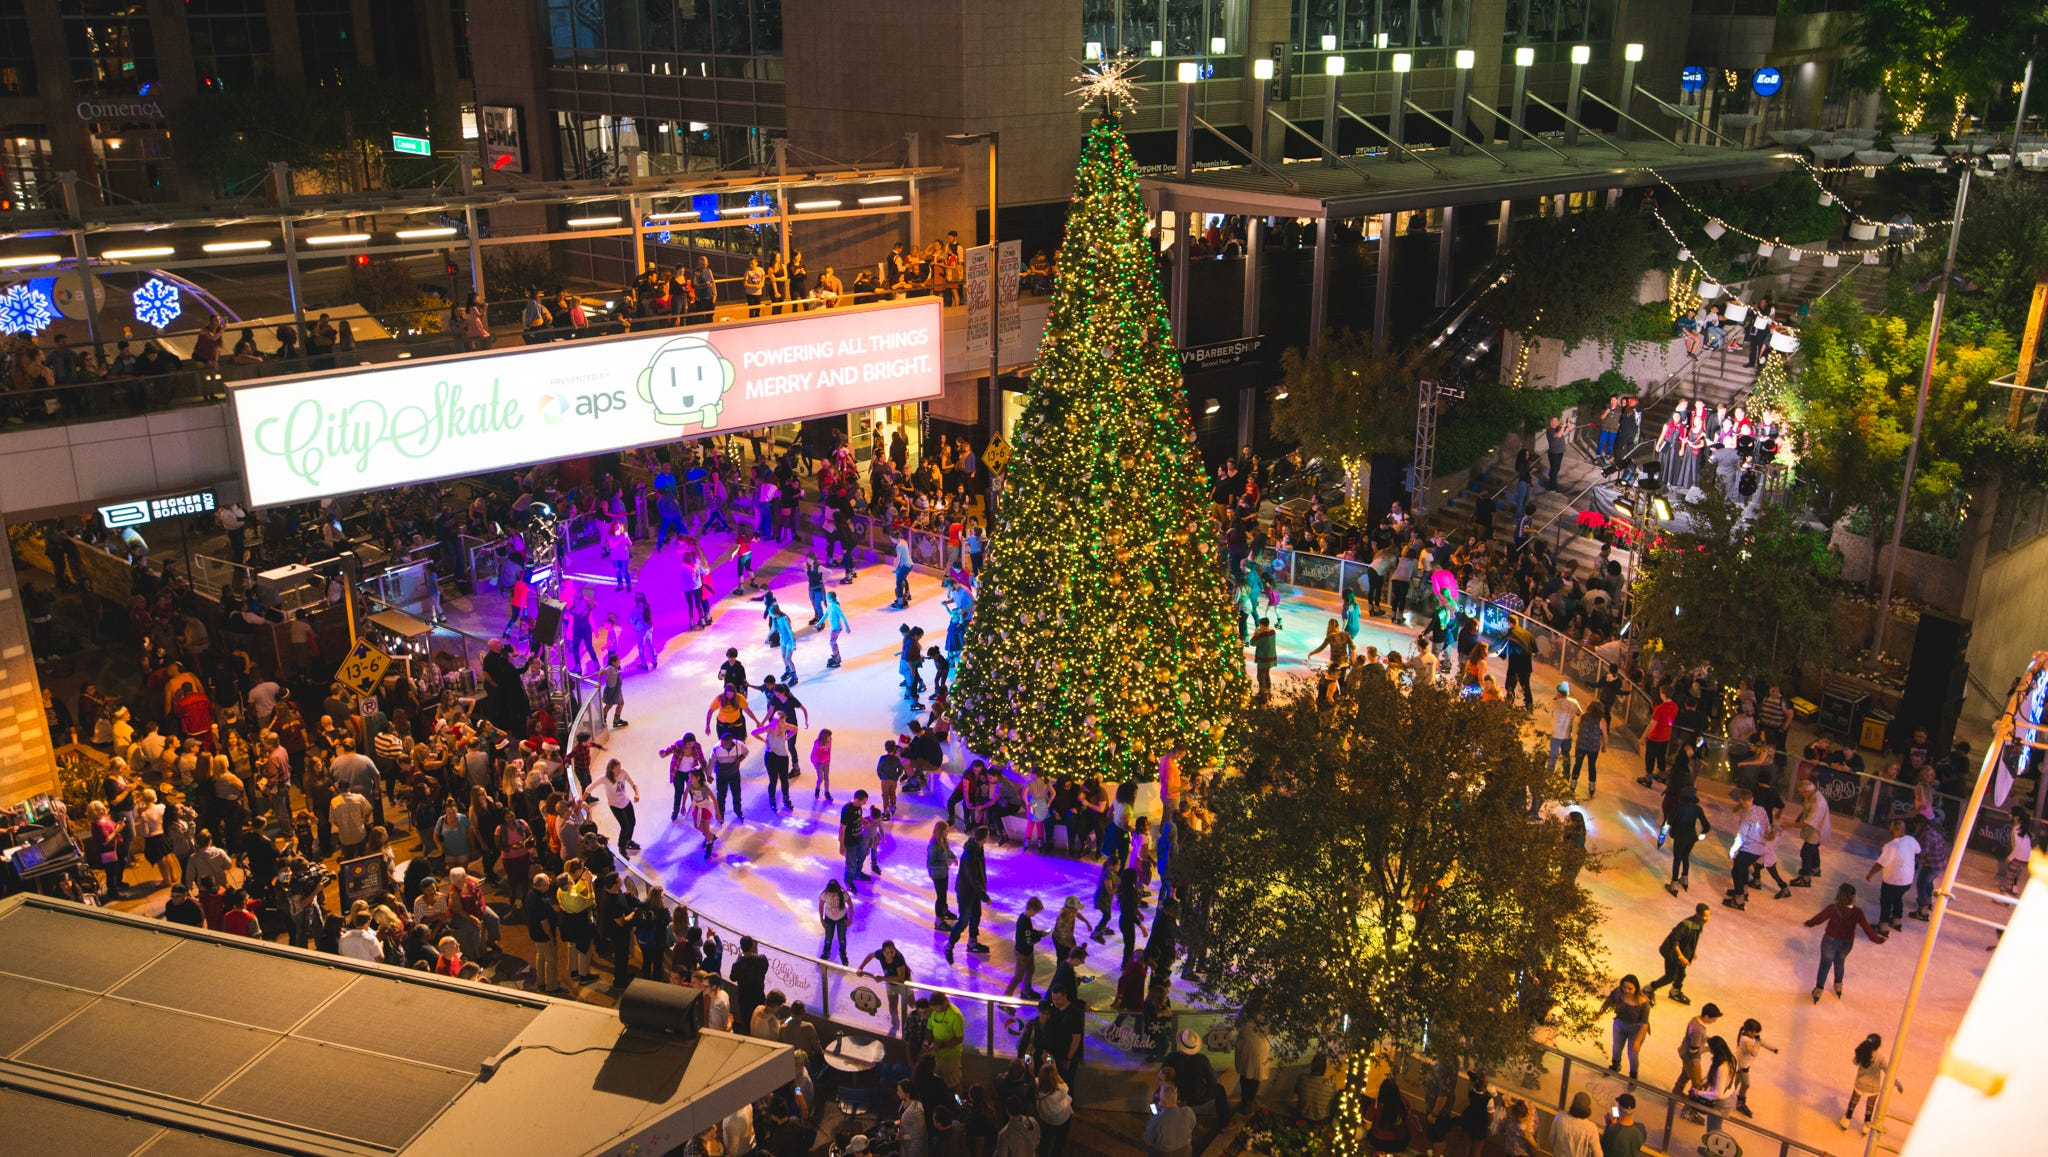 Christmas Activities In Arizona 2020 Phoenix Christmas events 2019: Holiday lights, skating, parades